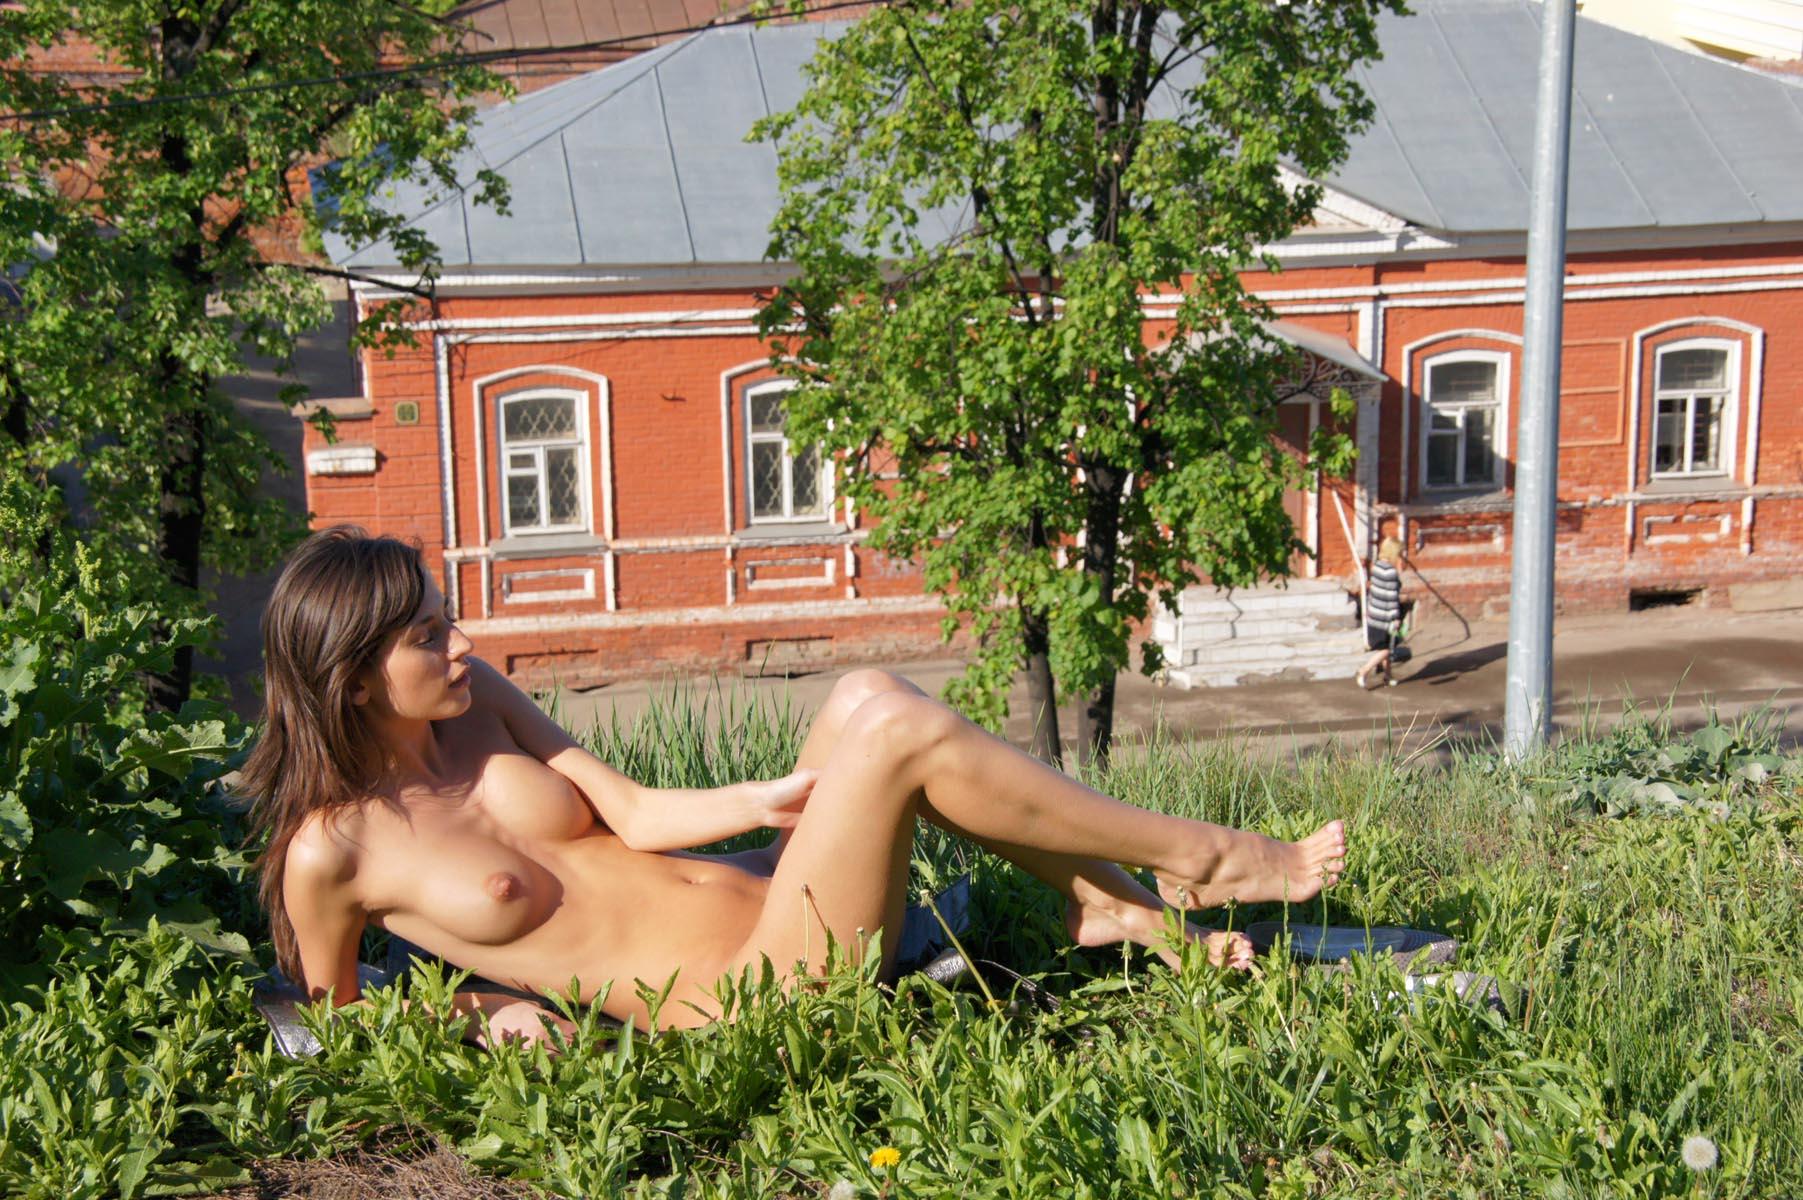 irina-k-naked-in-russia-kazan-nude-public-07